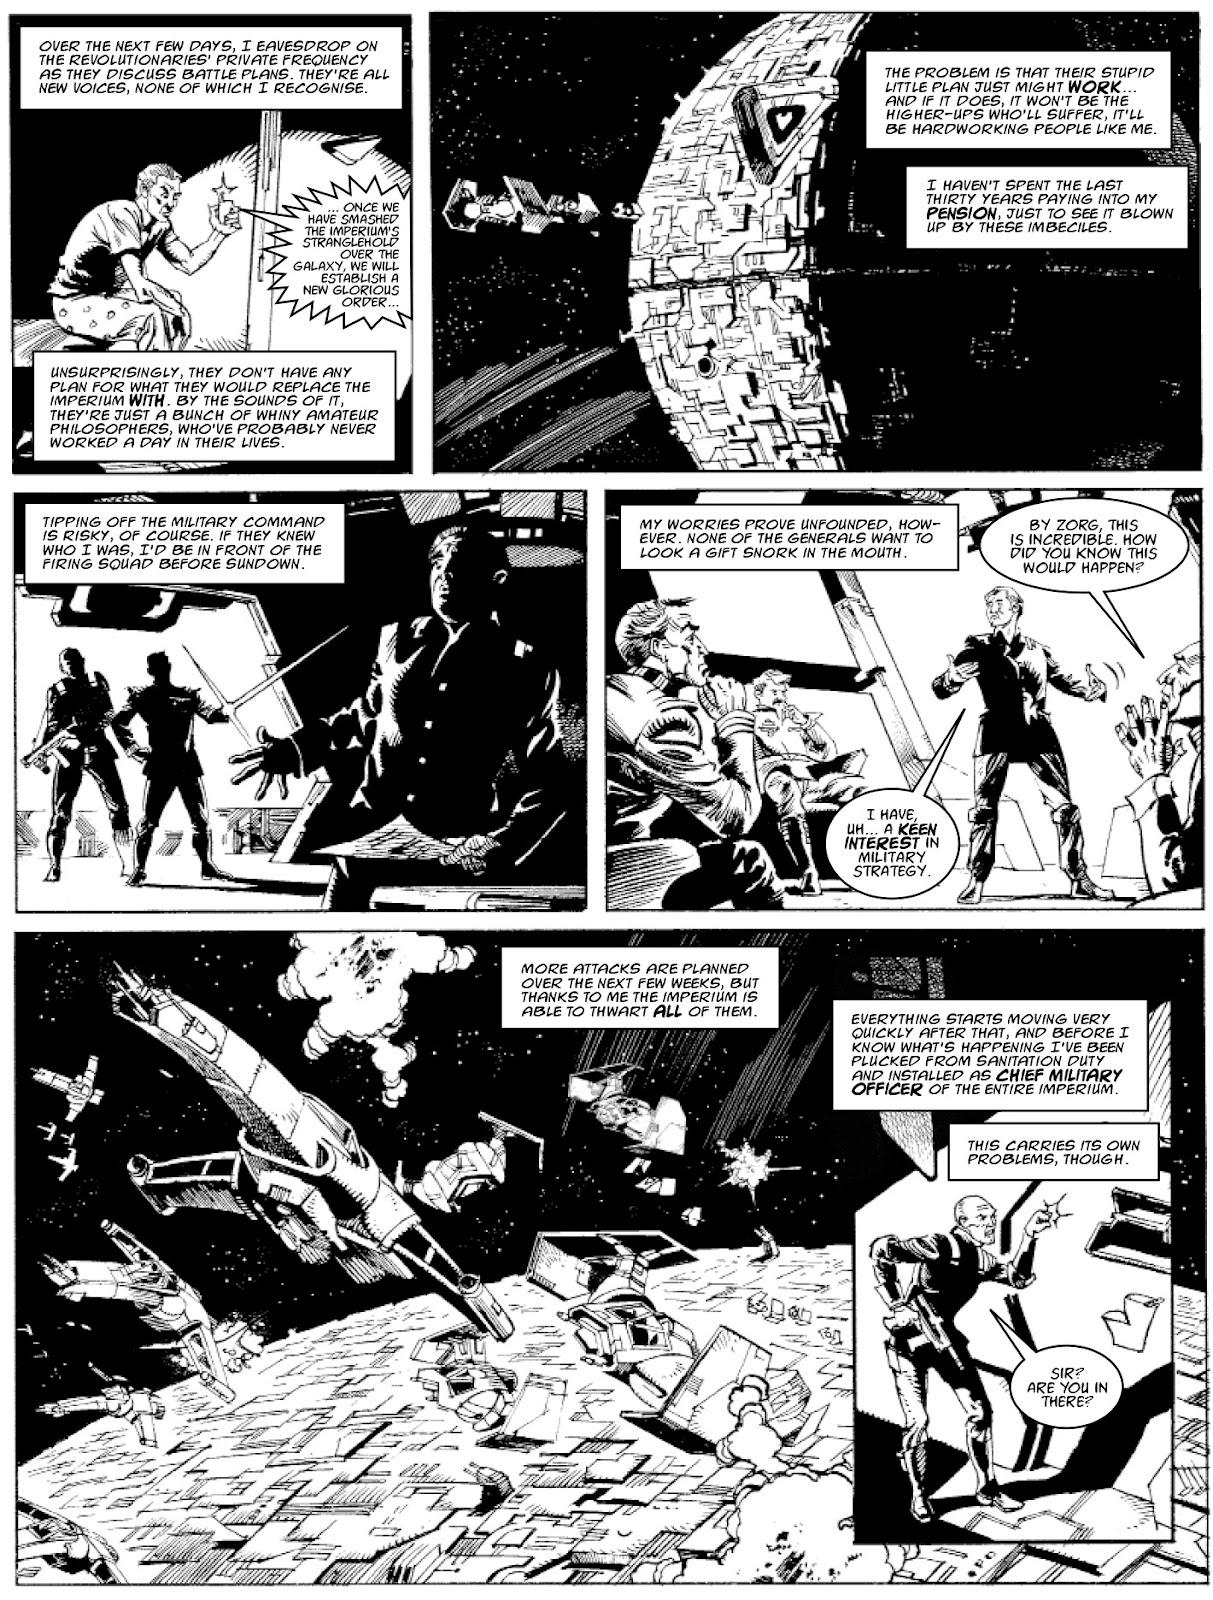 Judge Dredd Megazine (Vol. 5) issue 427 - Page 116